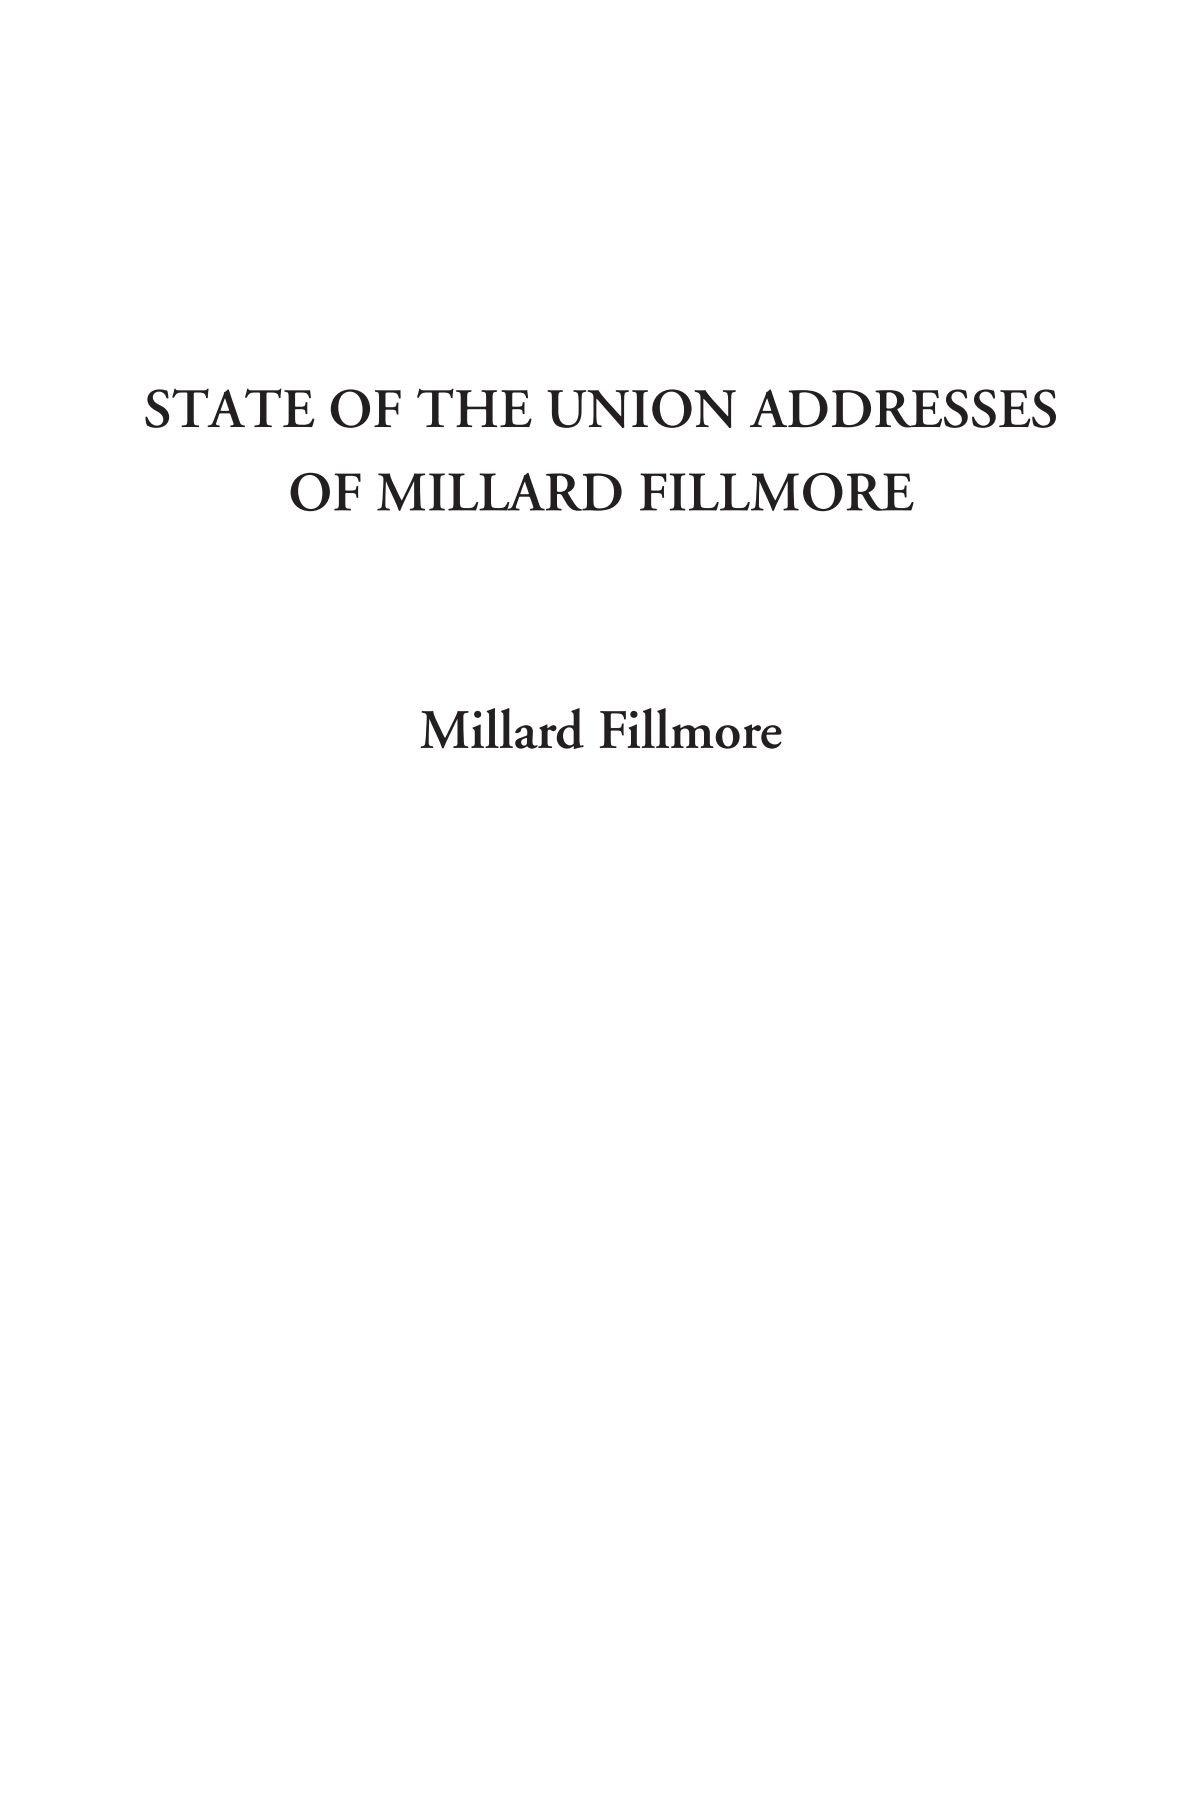 State of the Union Addresses of Millard Fillmore